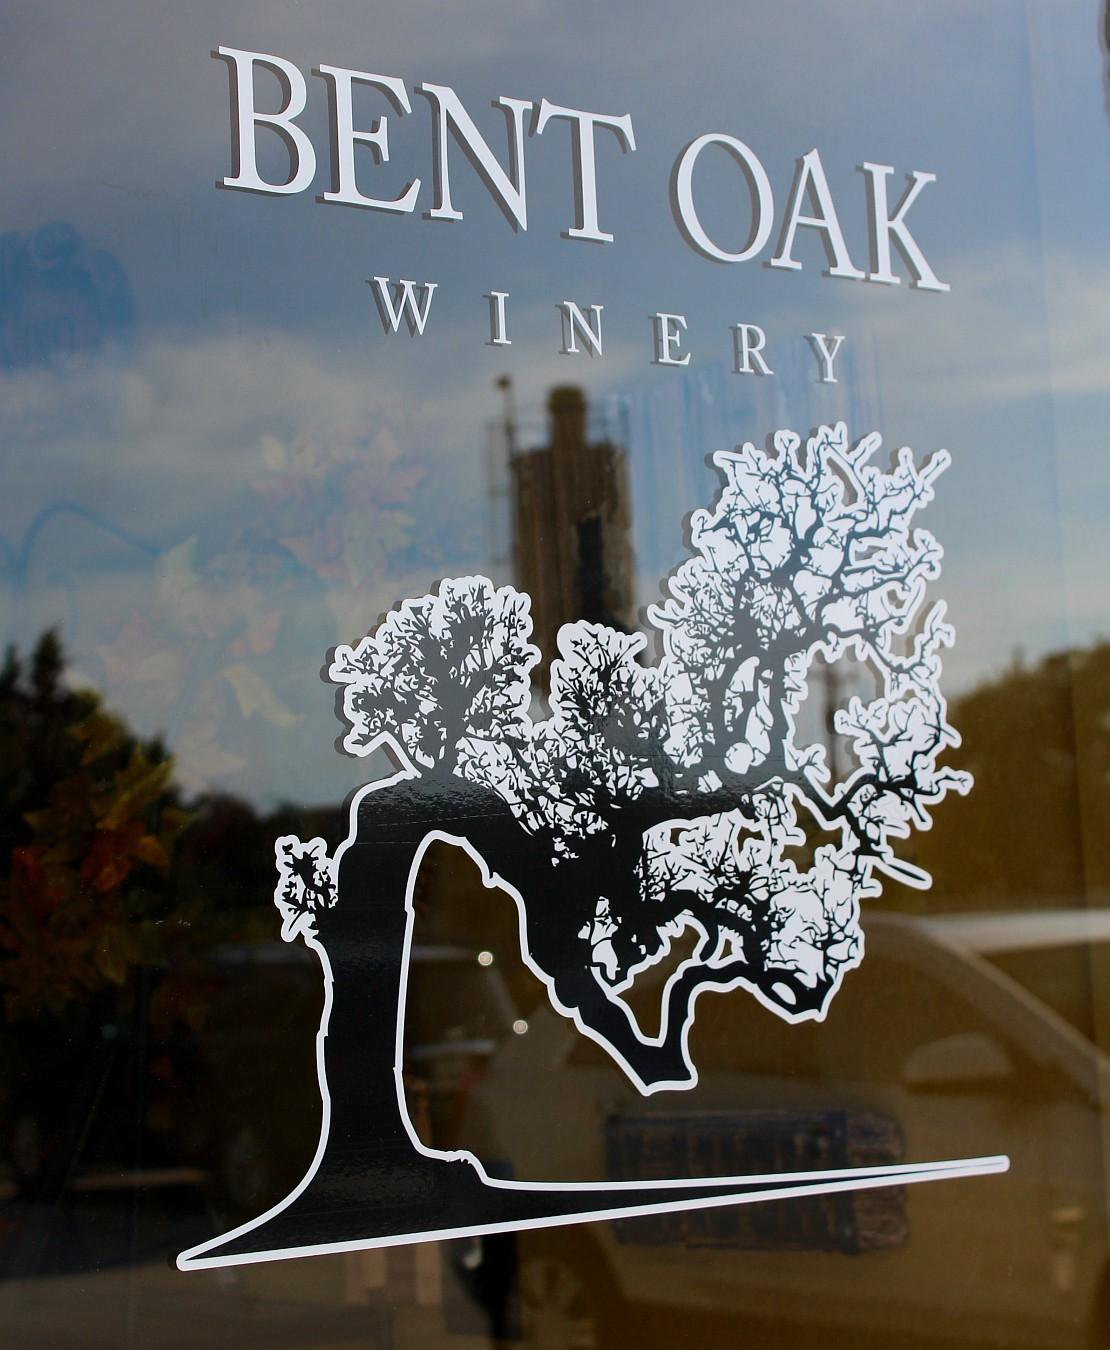 Bent Oak Winery sign